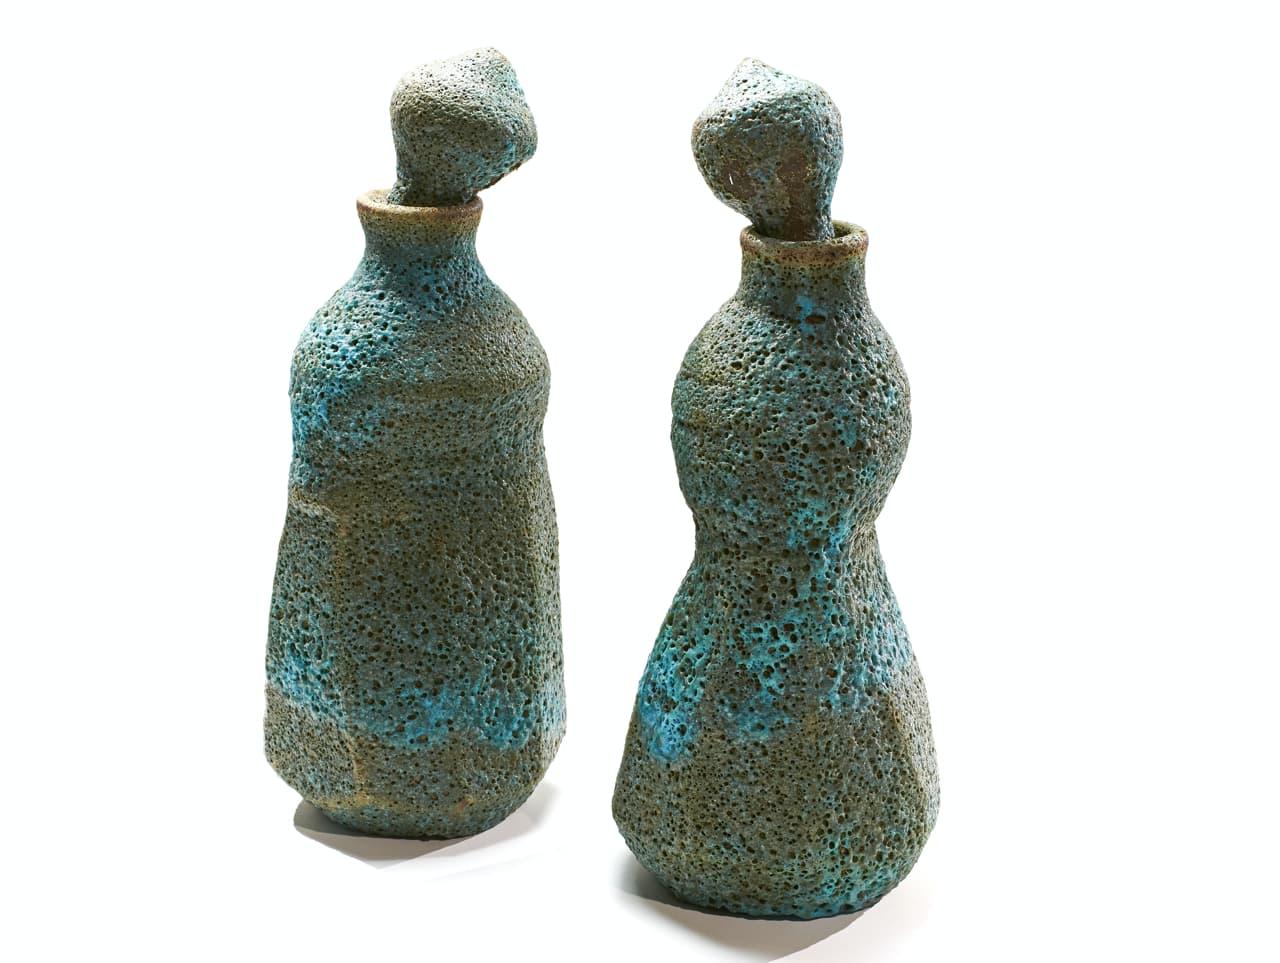 manousos chalkiadakis ceramic studio paidochori crete, manousos chalkiadakis artist chania crete, chania crete ceramic workshop, activities chania crete, best ceramic studio chania crete